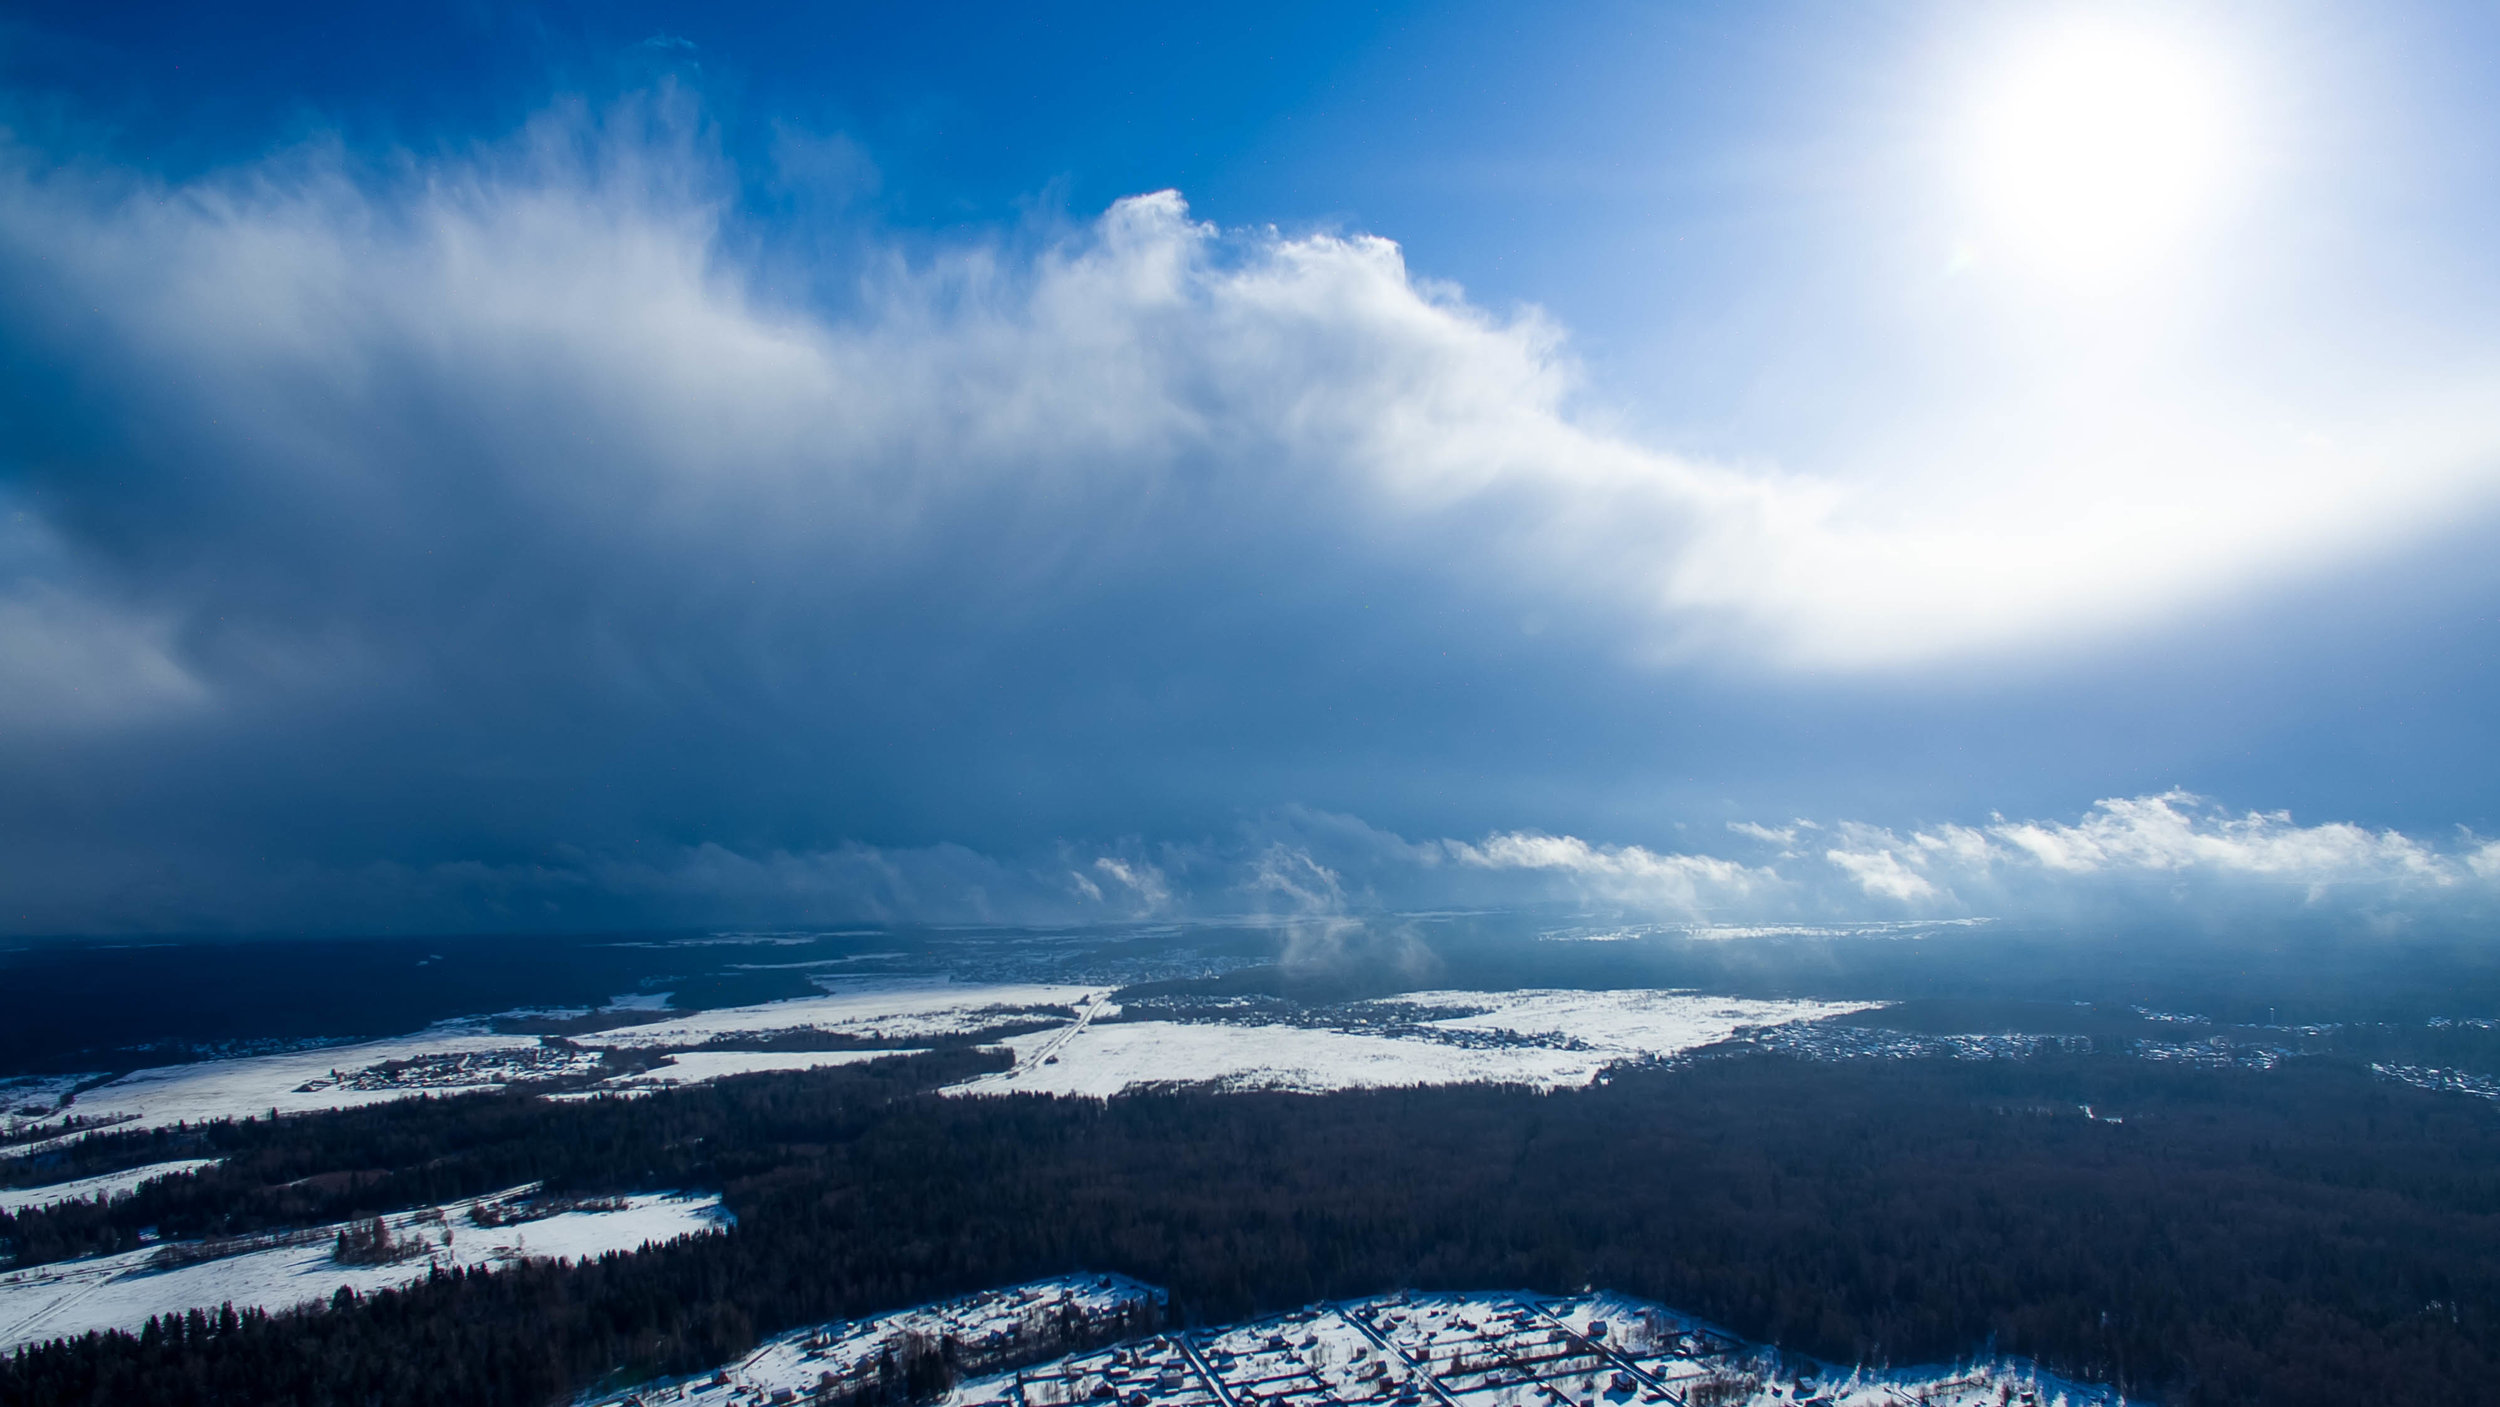 photo by:  Anton Gudkov